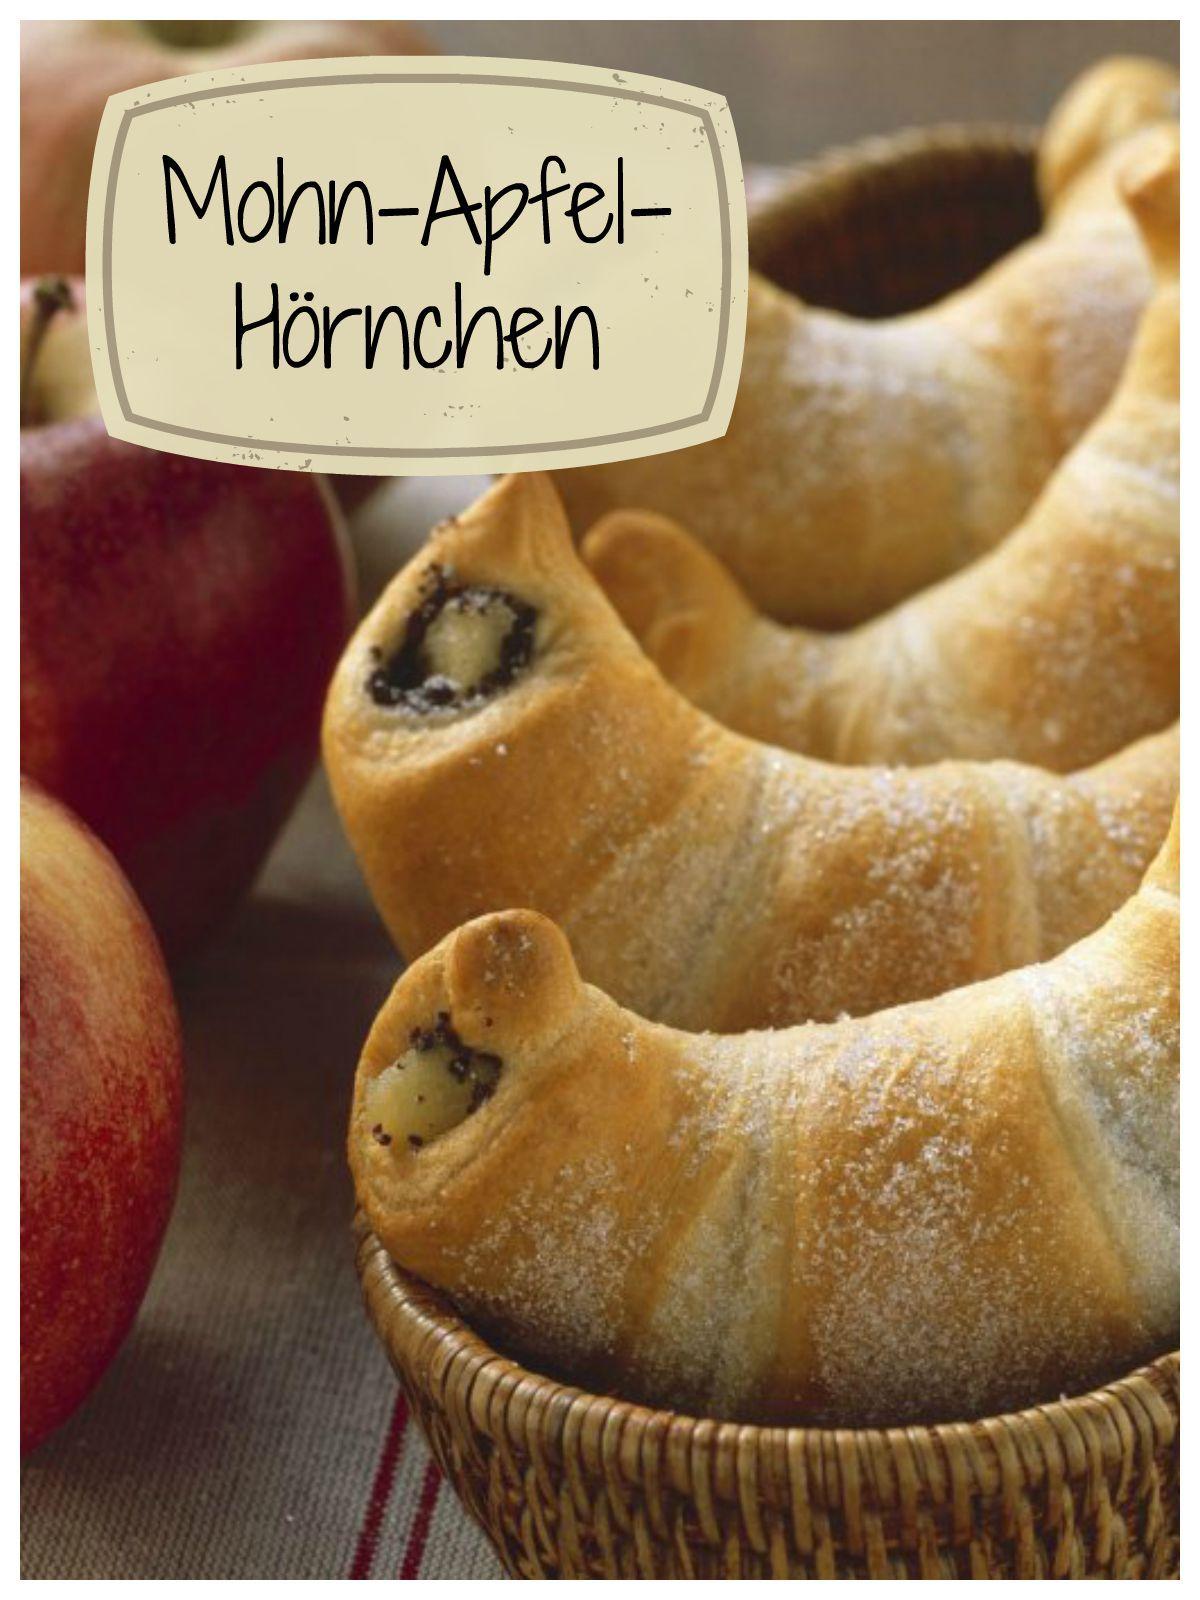 Dies Blitzrezept ist eine tolle Frühstücksidee: Mohn-Apfel-Hörnchen | http://eatsmarter.de/rezepte/mohn-apfel-hoernchen